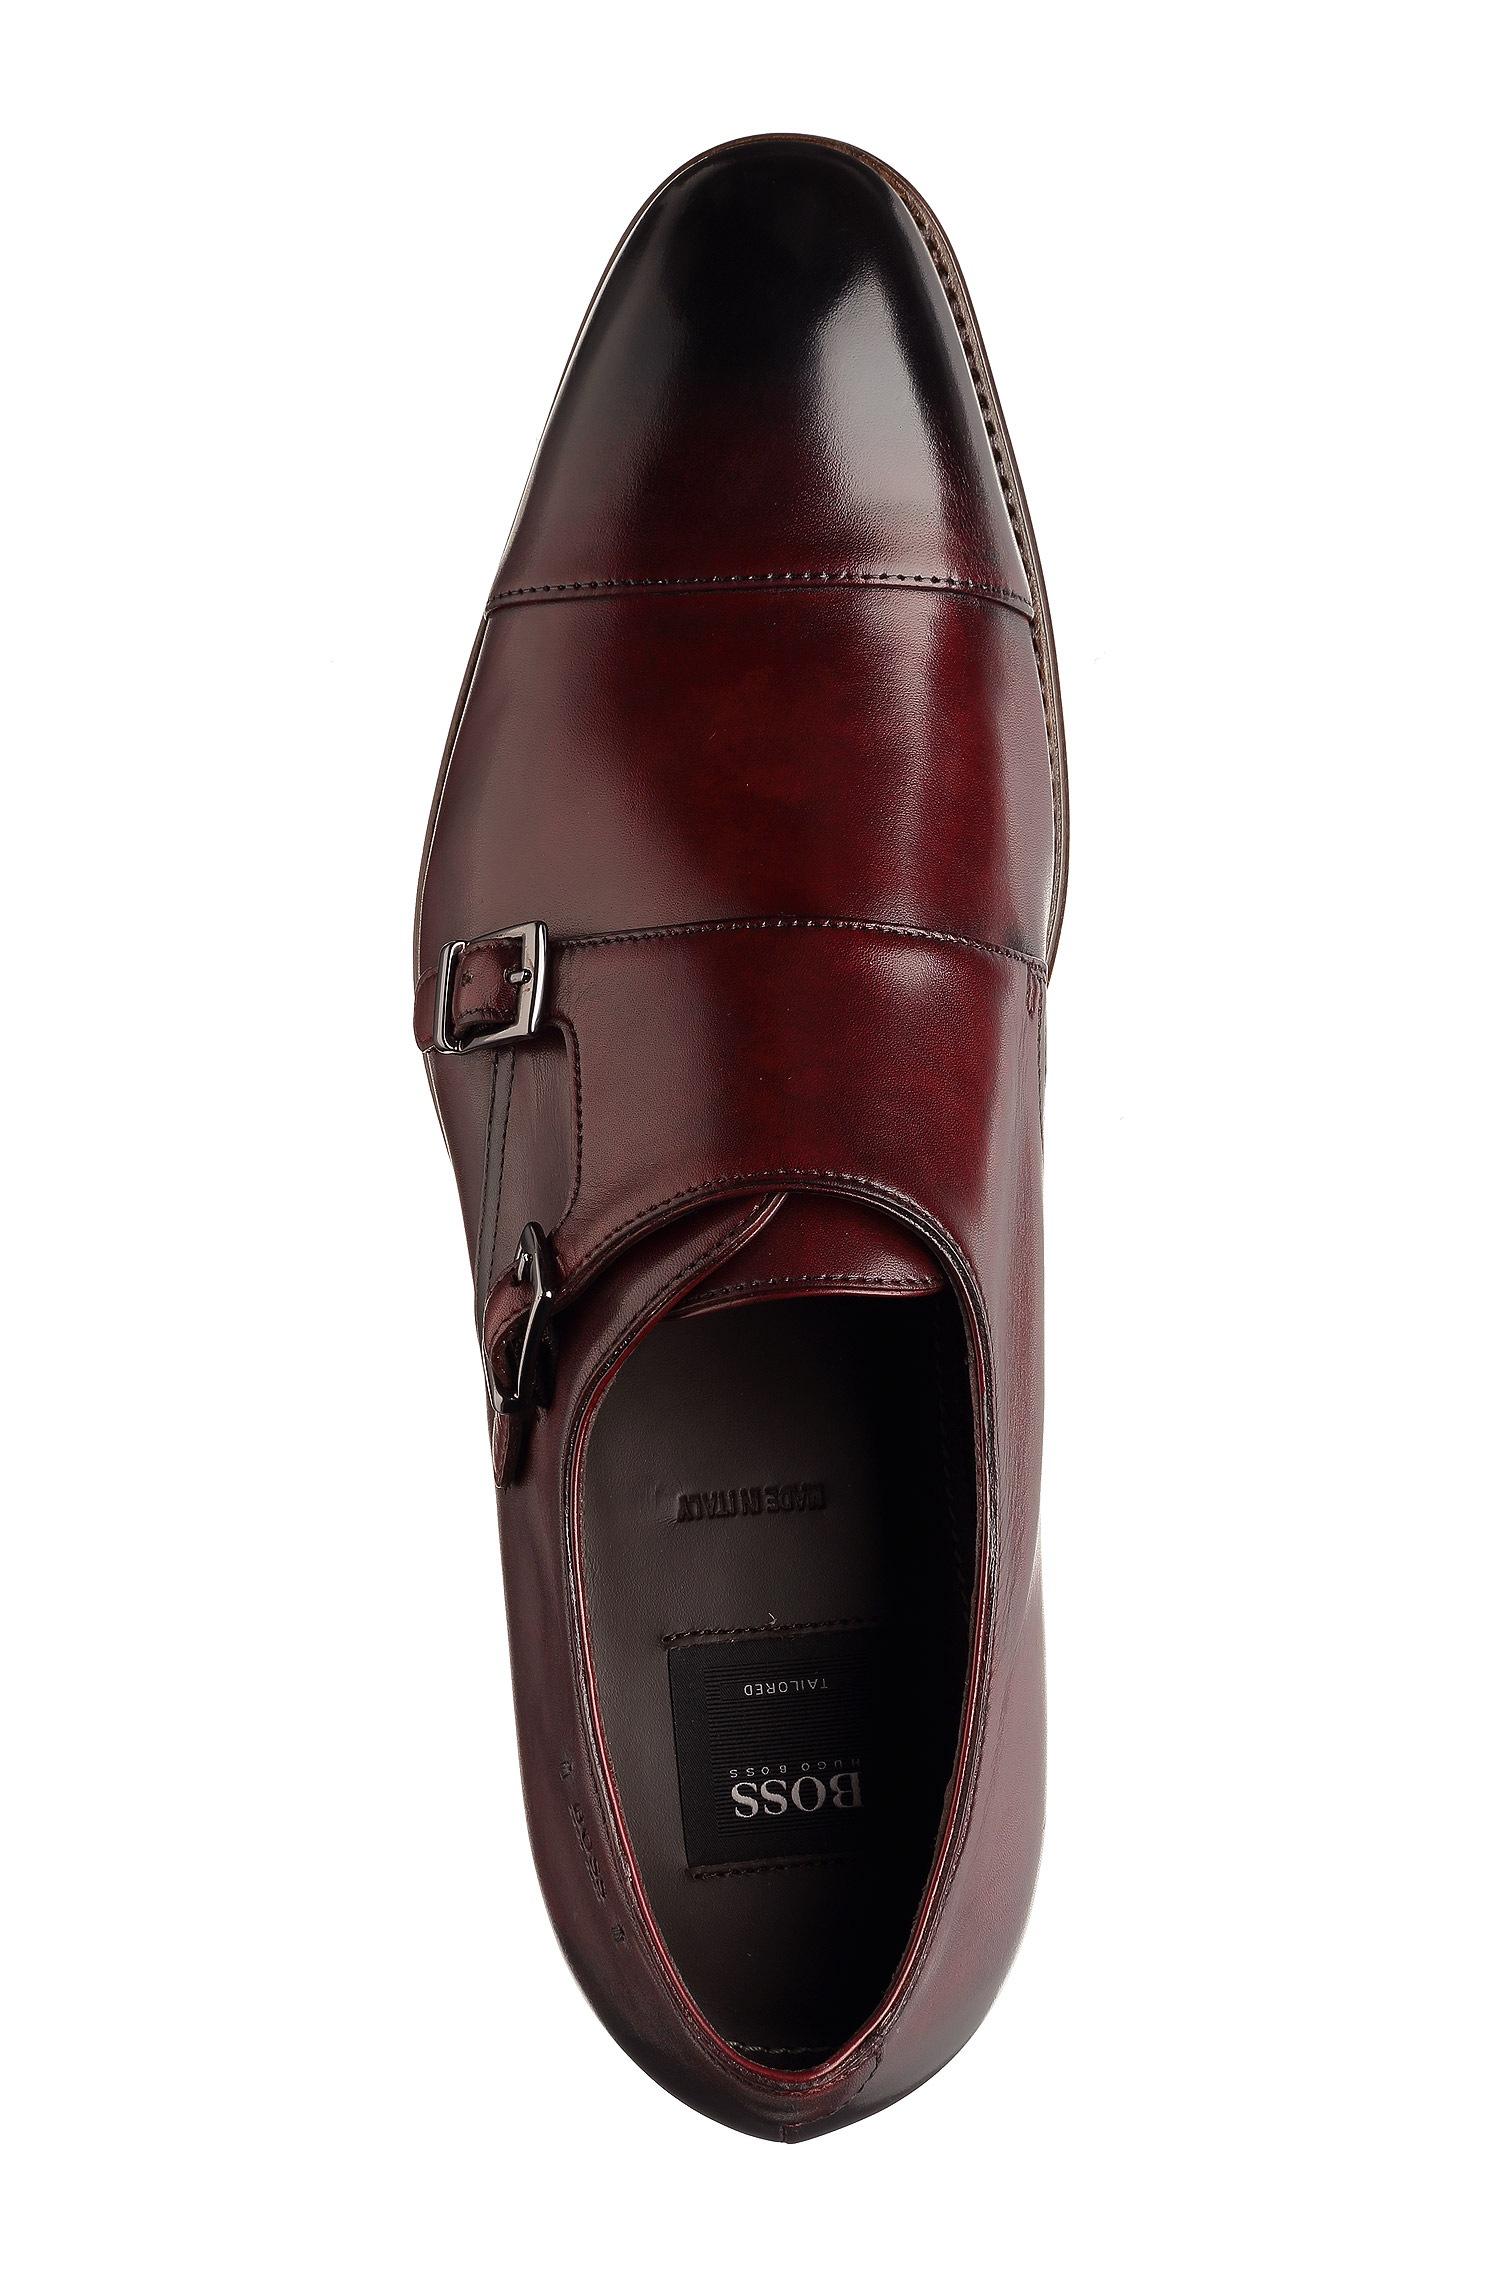 hugo boss monk strap shoes get 1221c 119c1